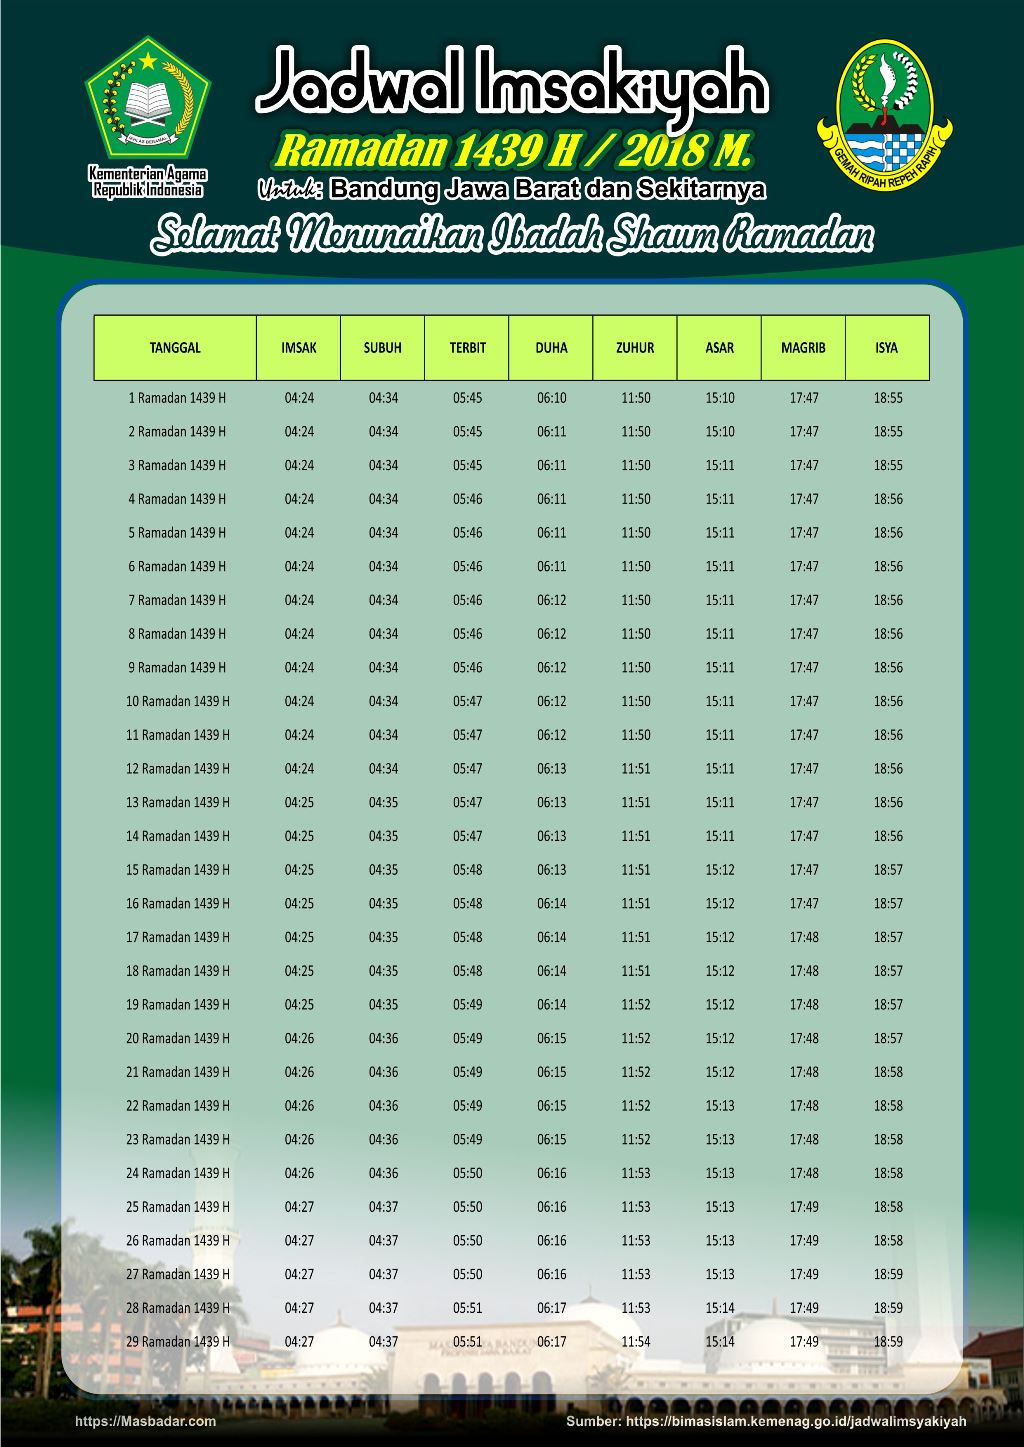 Jadwal Imsakiyah 1439 Ramadan 2018 Kota Besar Kabupaten ...